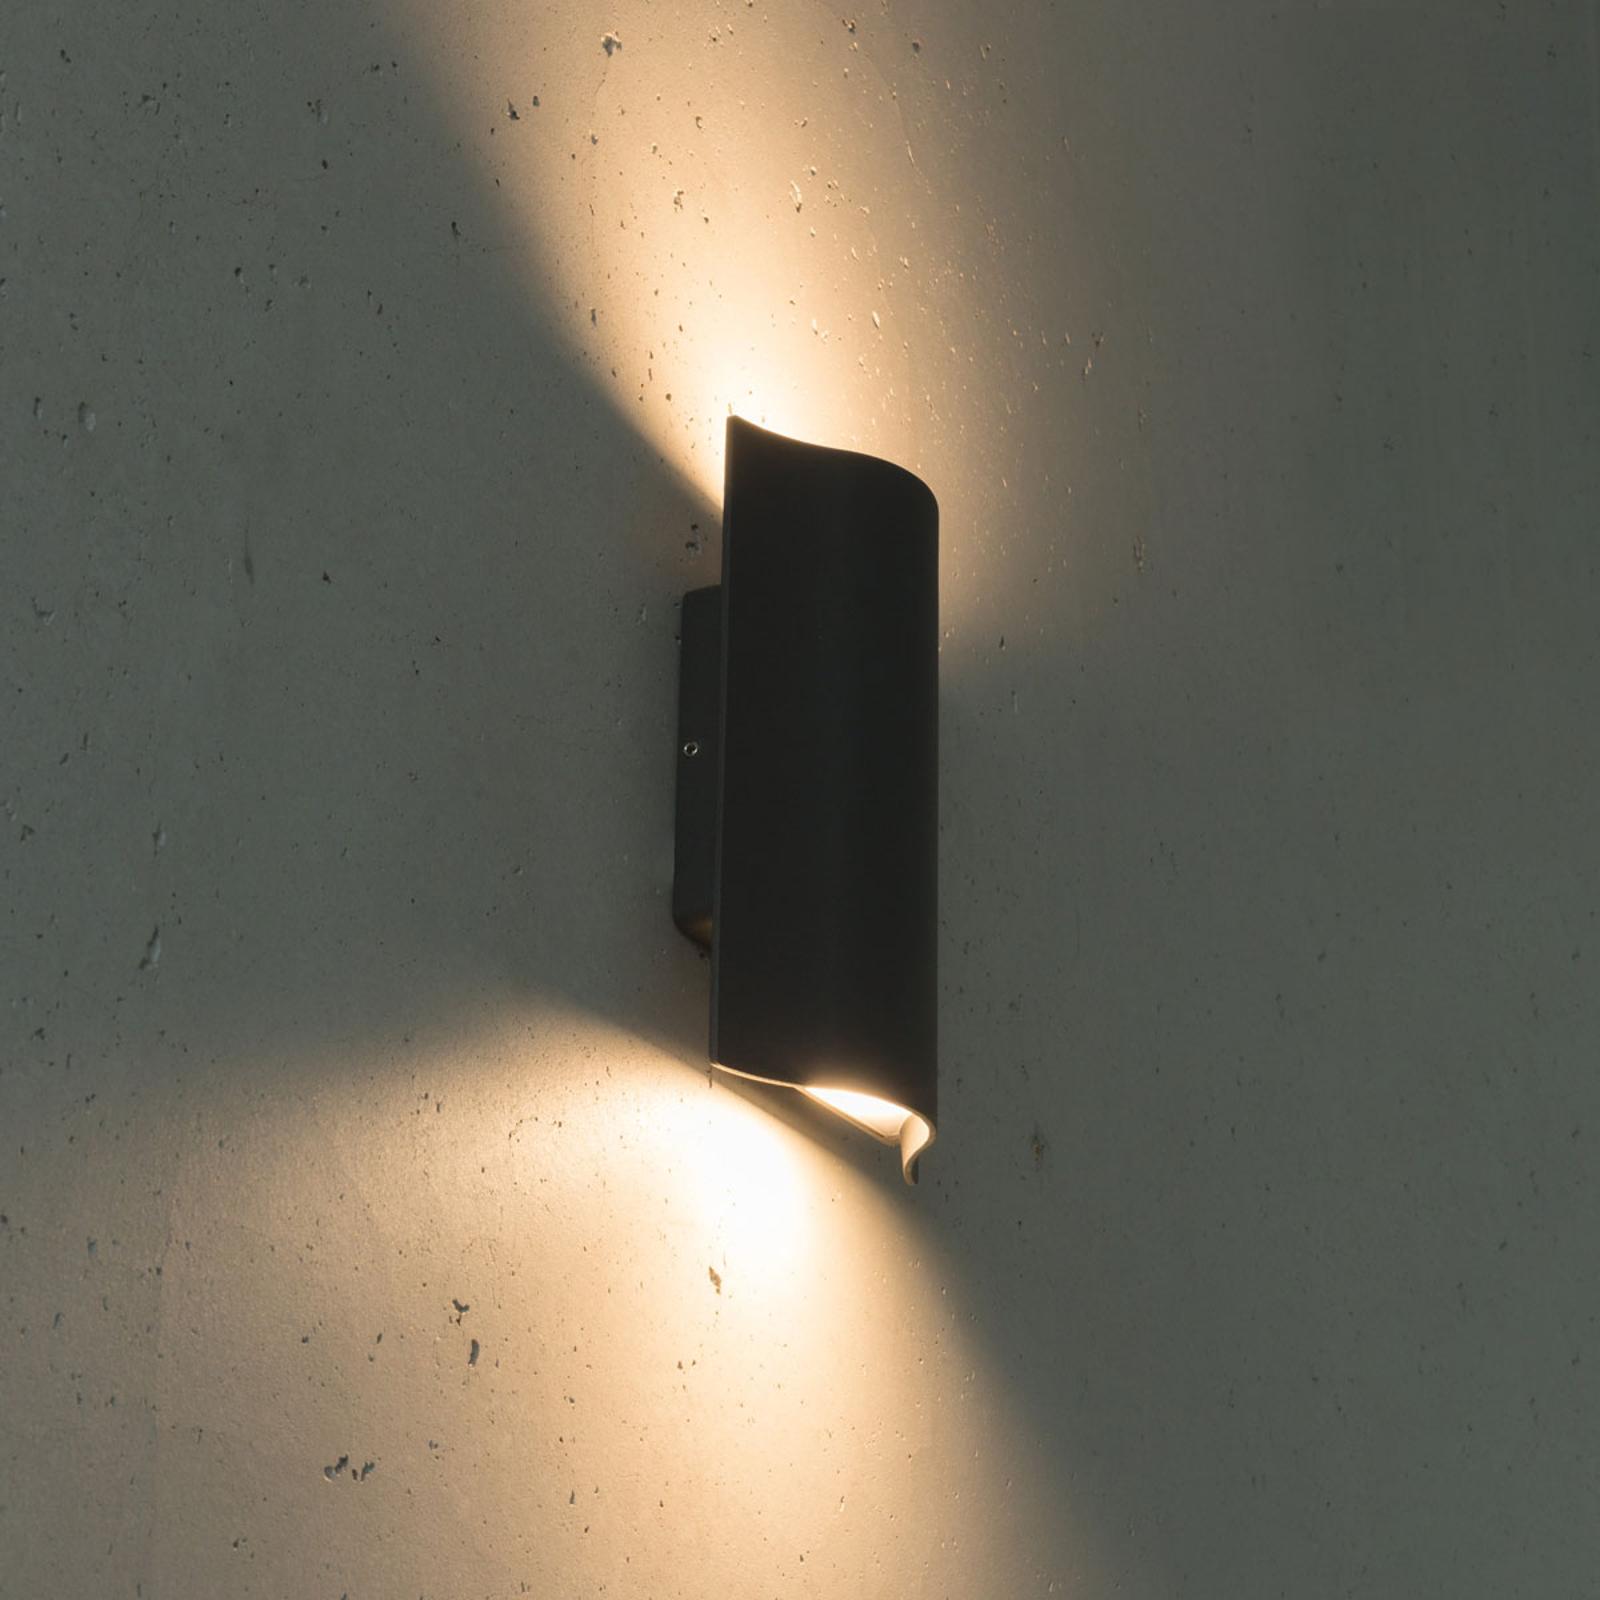 LED-ulkoseinälamppu Laola